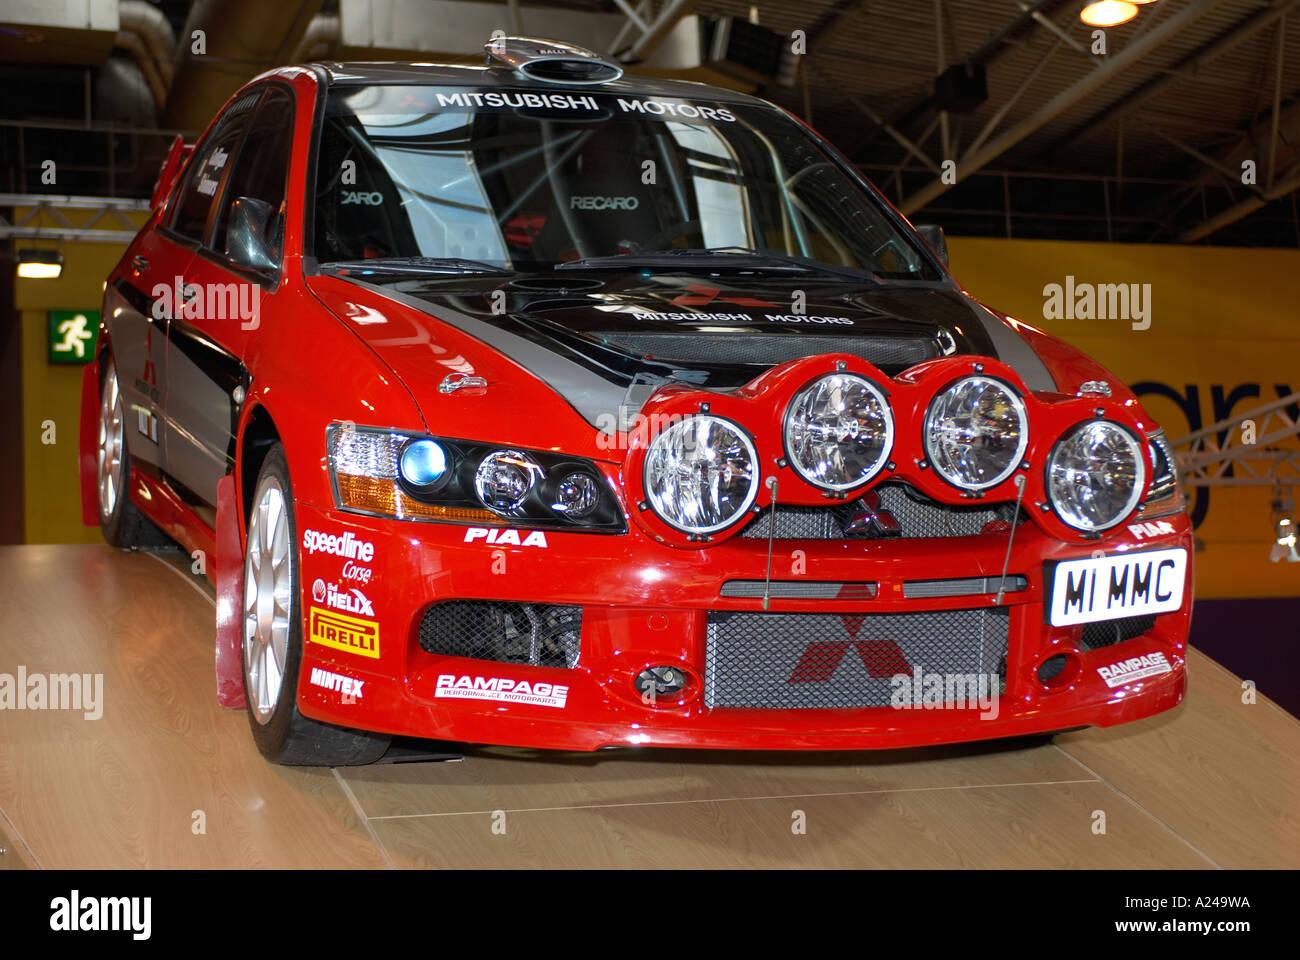 Mitsubishi Lancer Evo Rally Car Autosport Show 2006 Stock Photo